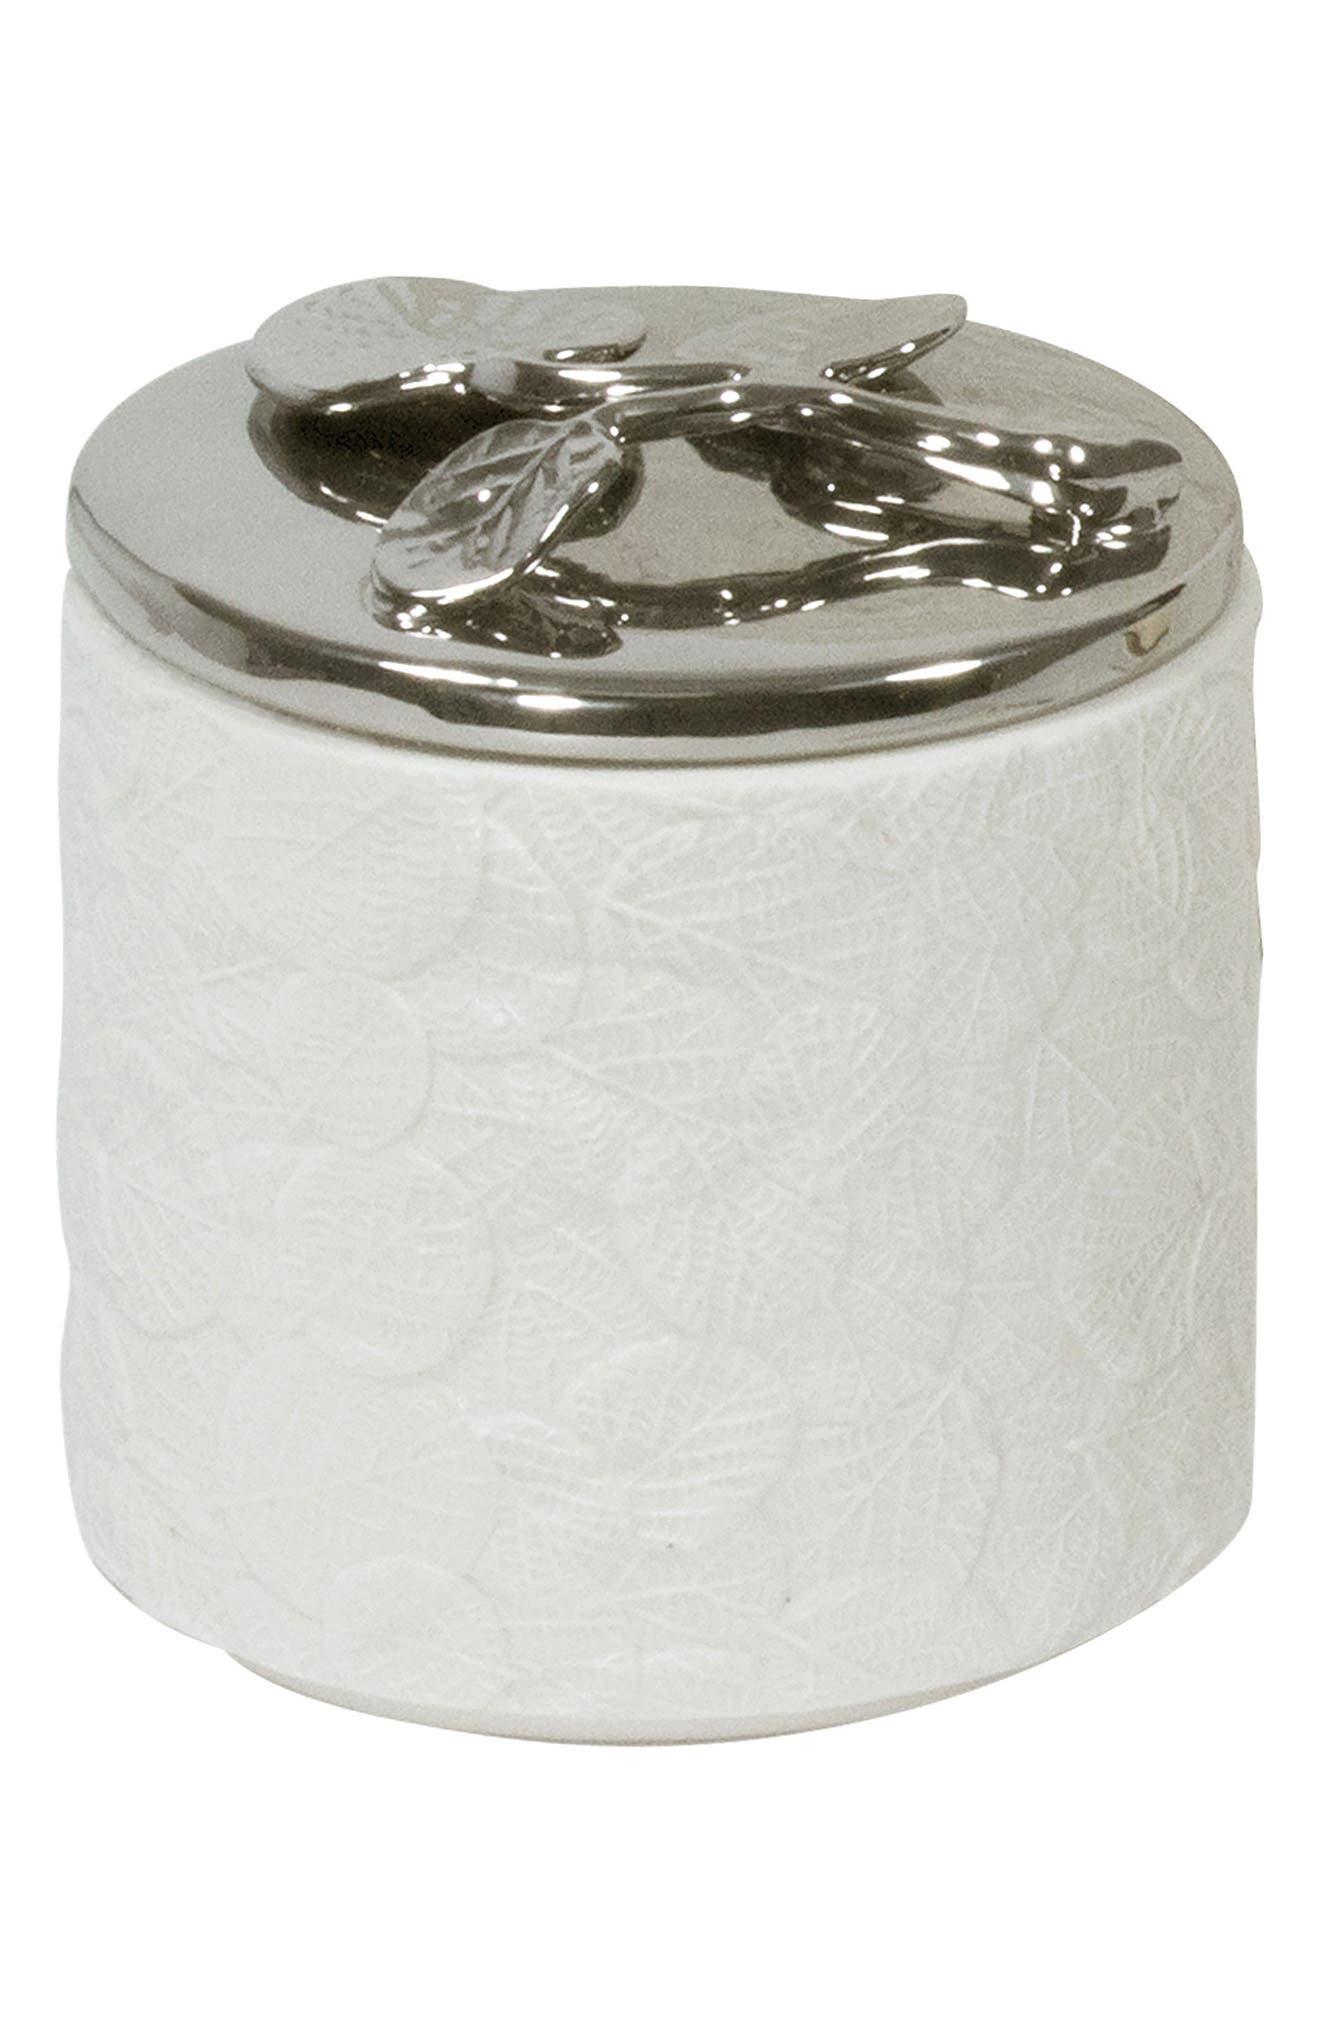 Botanical Leaf Porcelain Jar,                             Main thumbnail 1, color,                             White